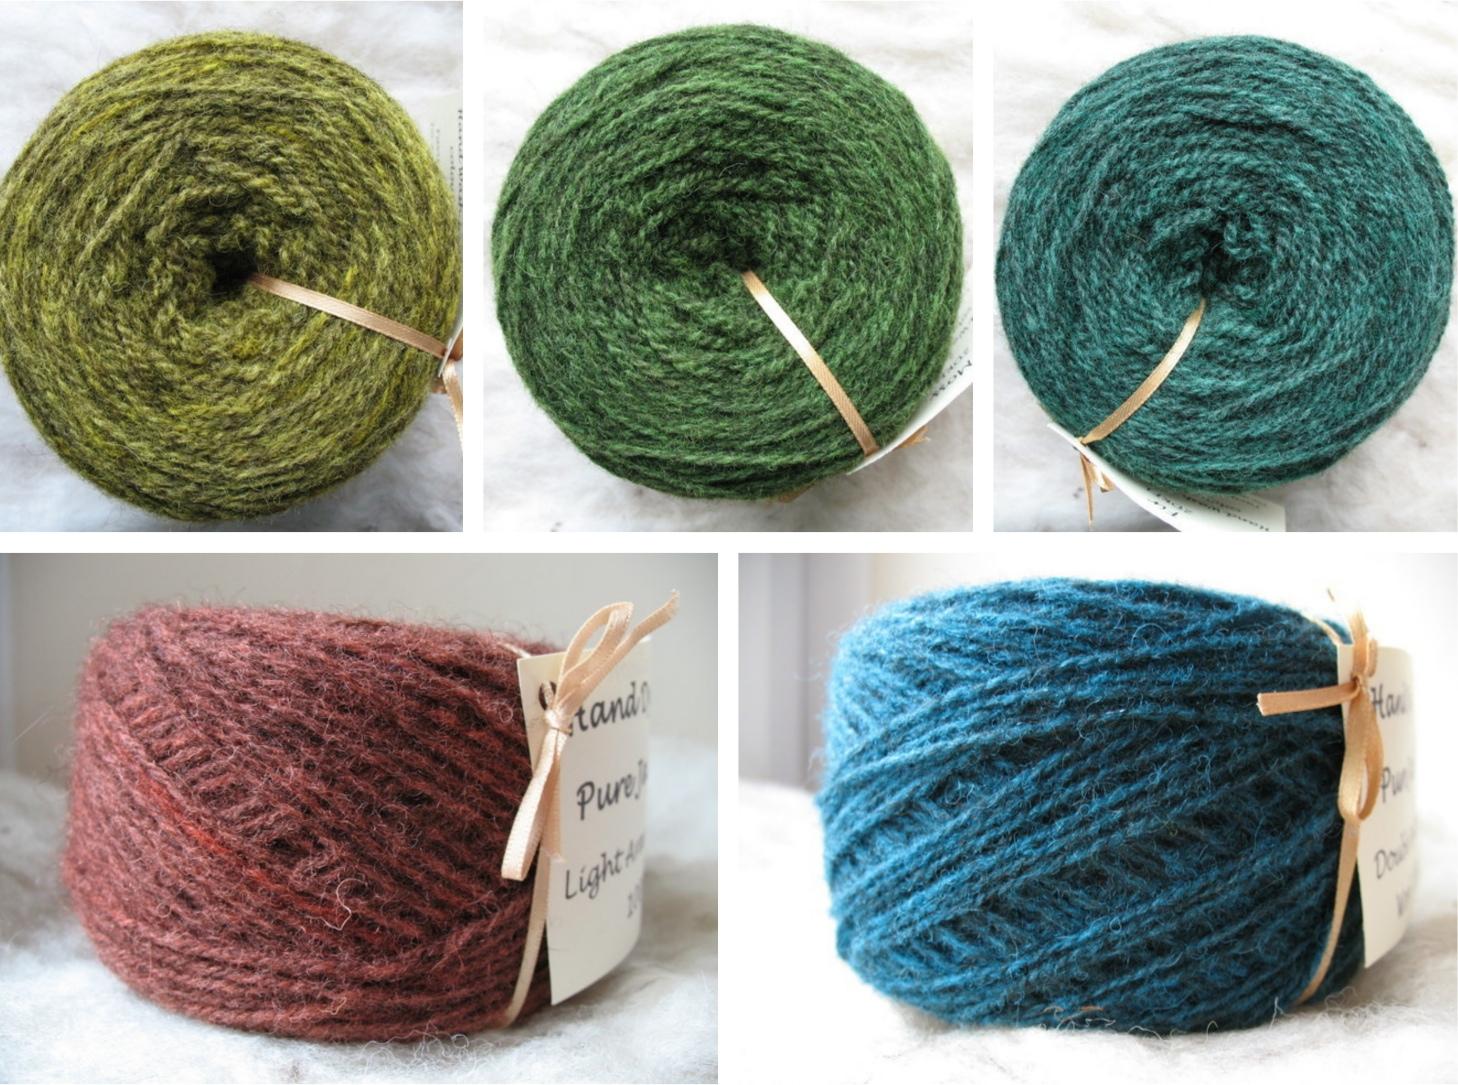 dyed yarns, knitting yarns, uk, hand dyed, tavistock,